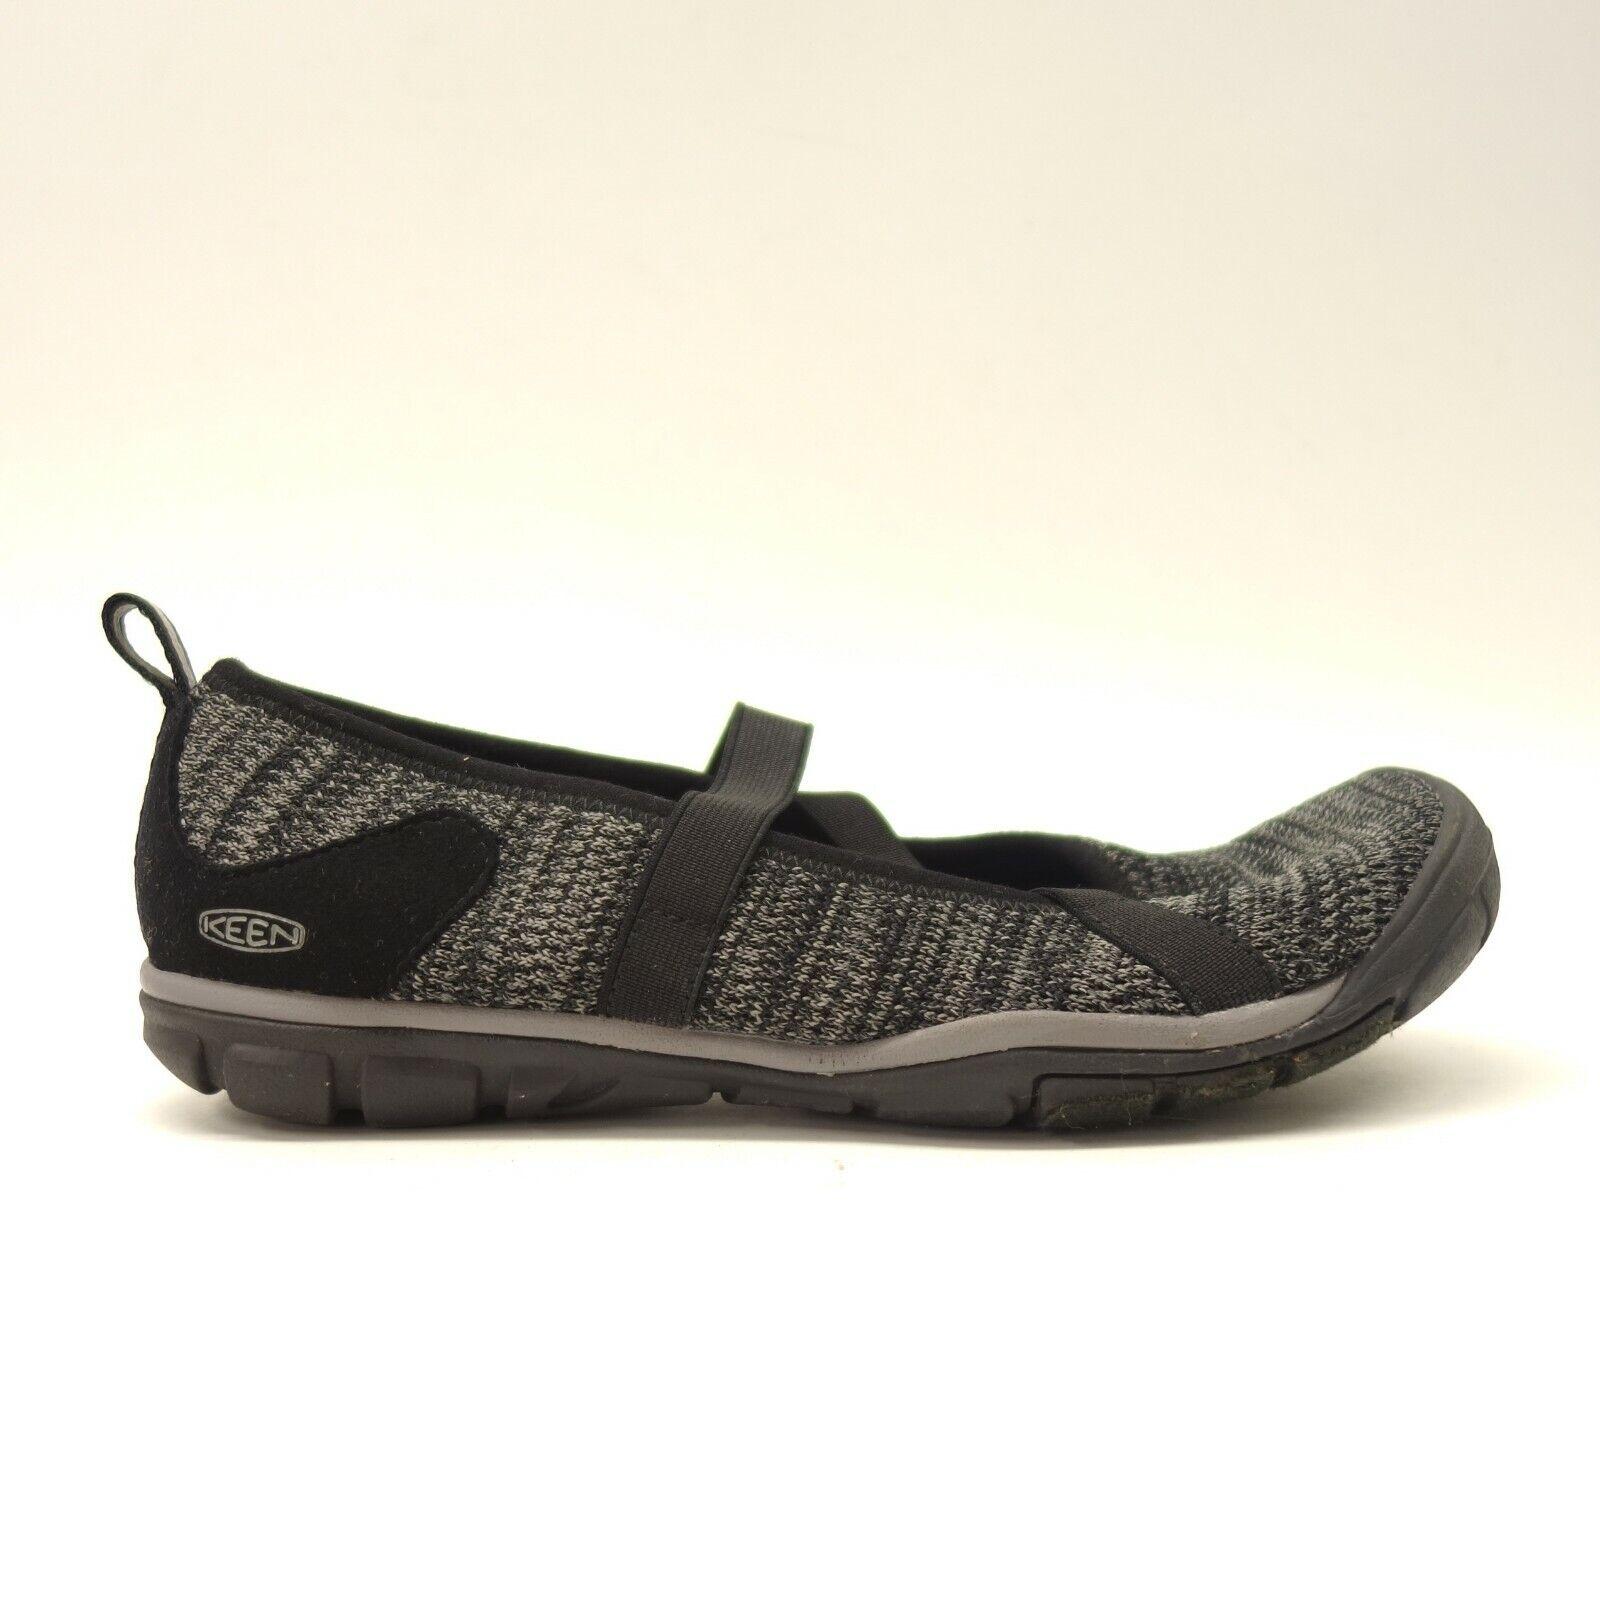 Keen US 7.5 EU 38 Womens Hush Knit MJ Mary Jane Casual Slip On shoes Flats New